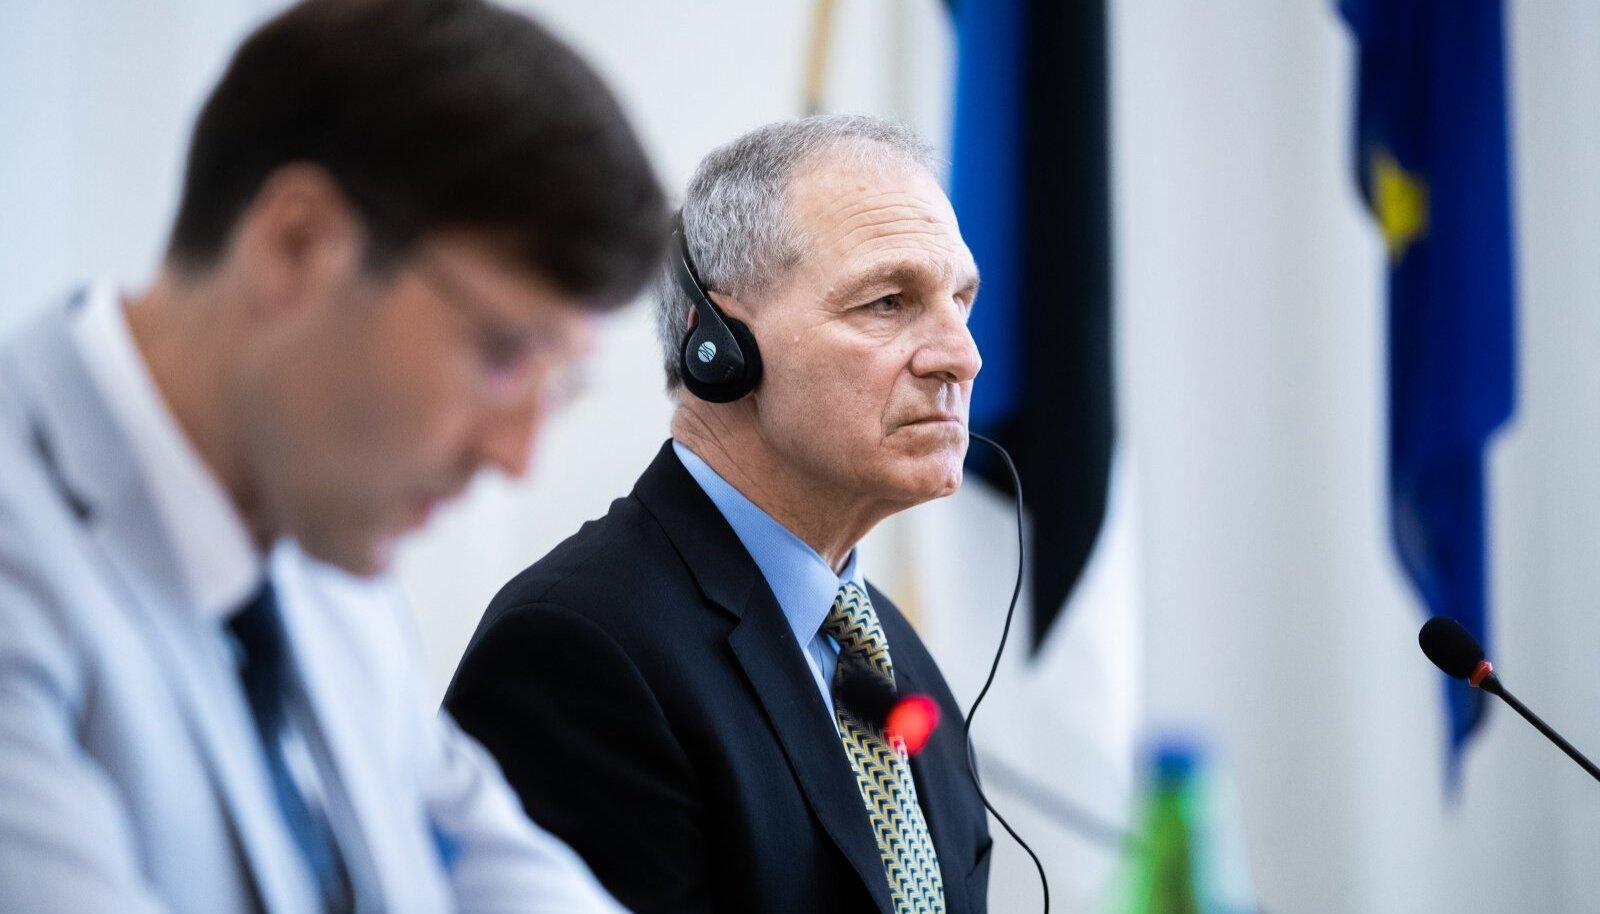 Martin Helme ja advokaadibüroo Freeh Sporkin & Sullivan LLP juht ja asutaja Louis Freeh 'i pressikonverents